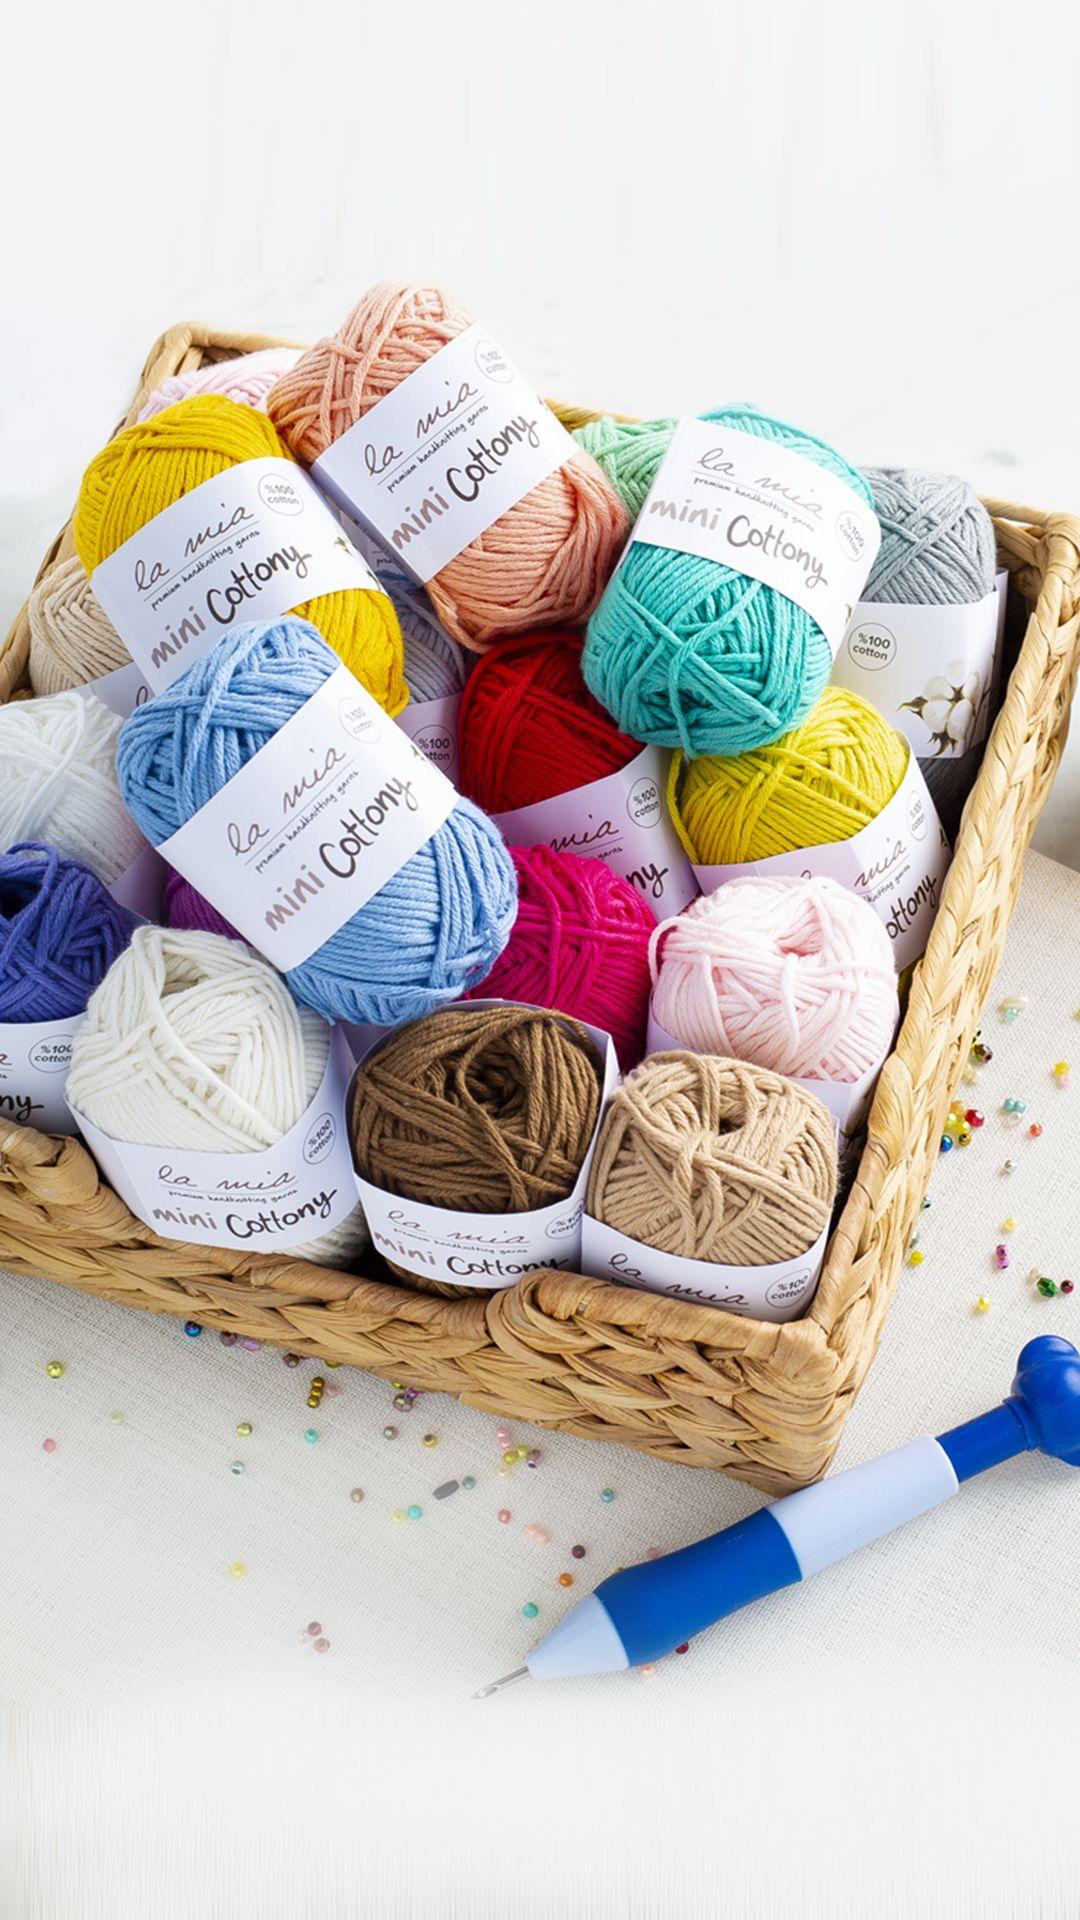 La Mia Mini Cottony Wallpaper Crochet Storage Wallpaper New Wallpaper